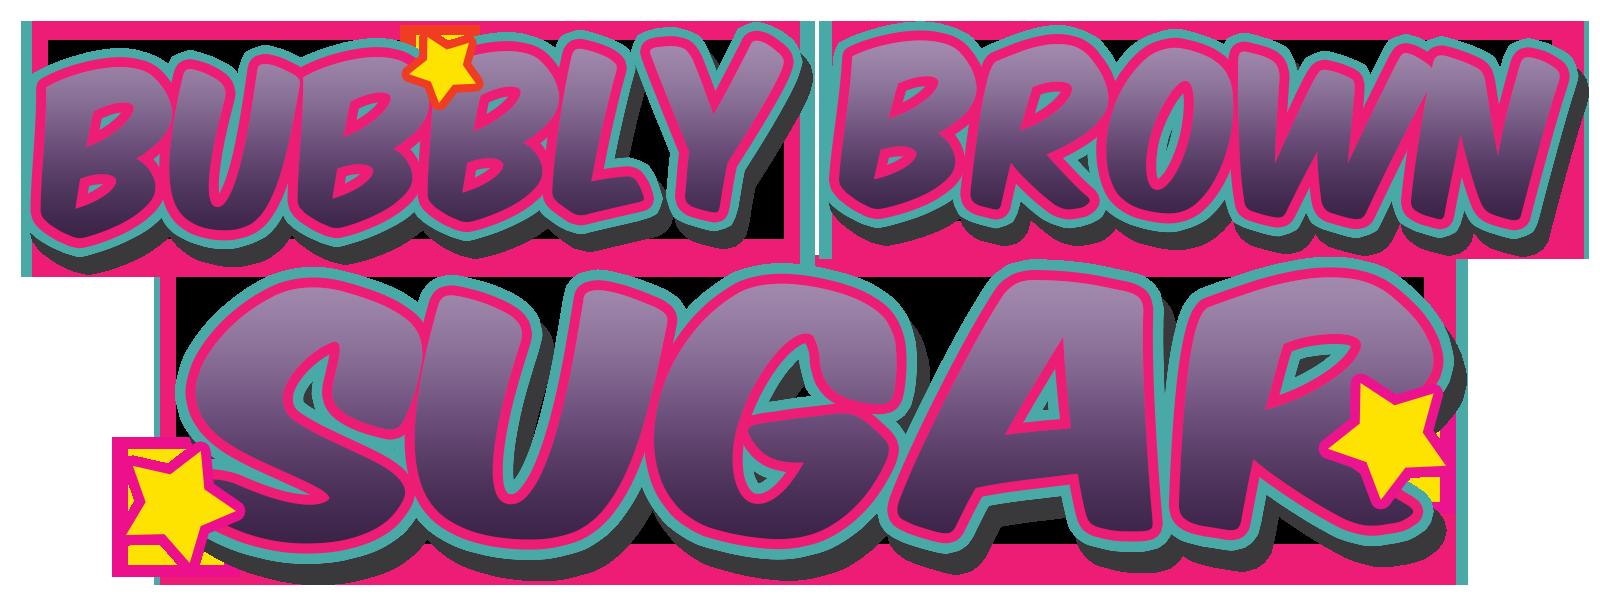 Award-Winning Series that Celebrates Black Joy Releases Season Finale on YouTube